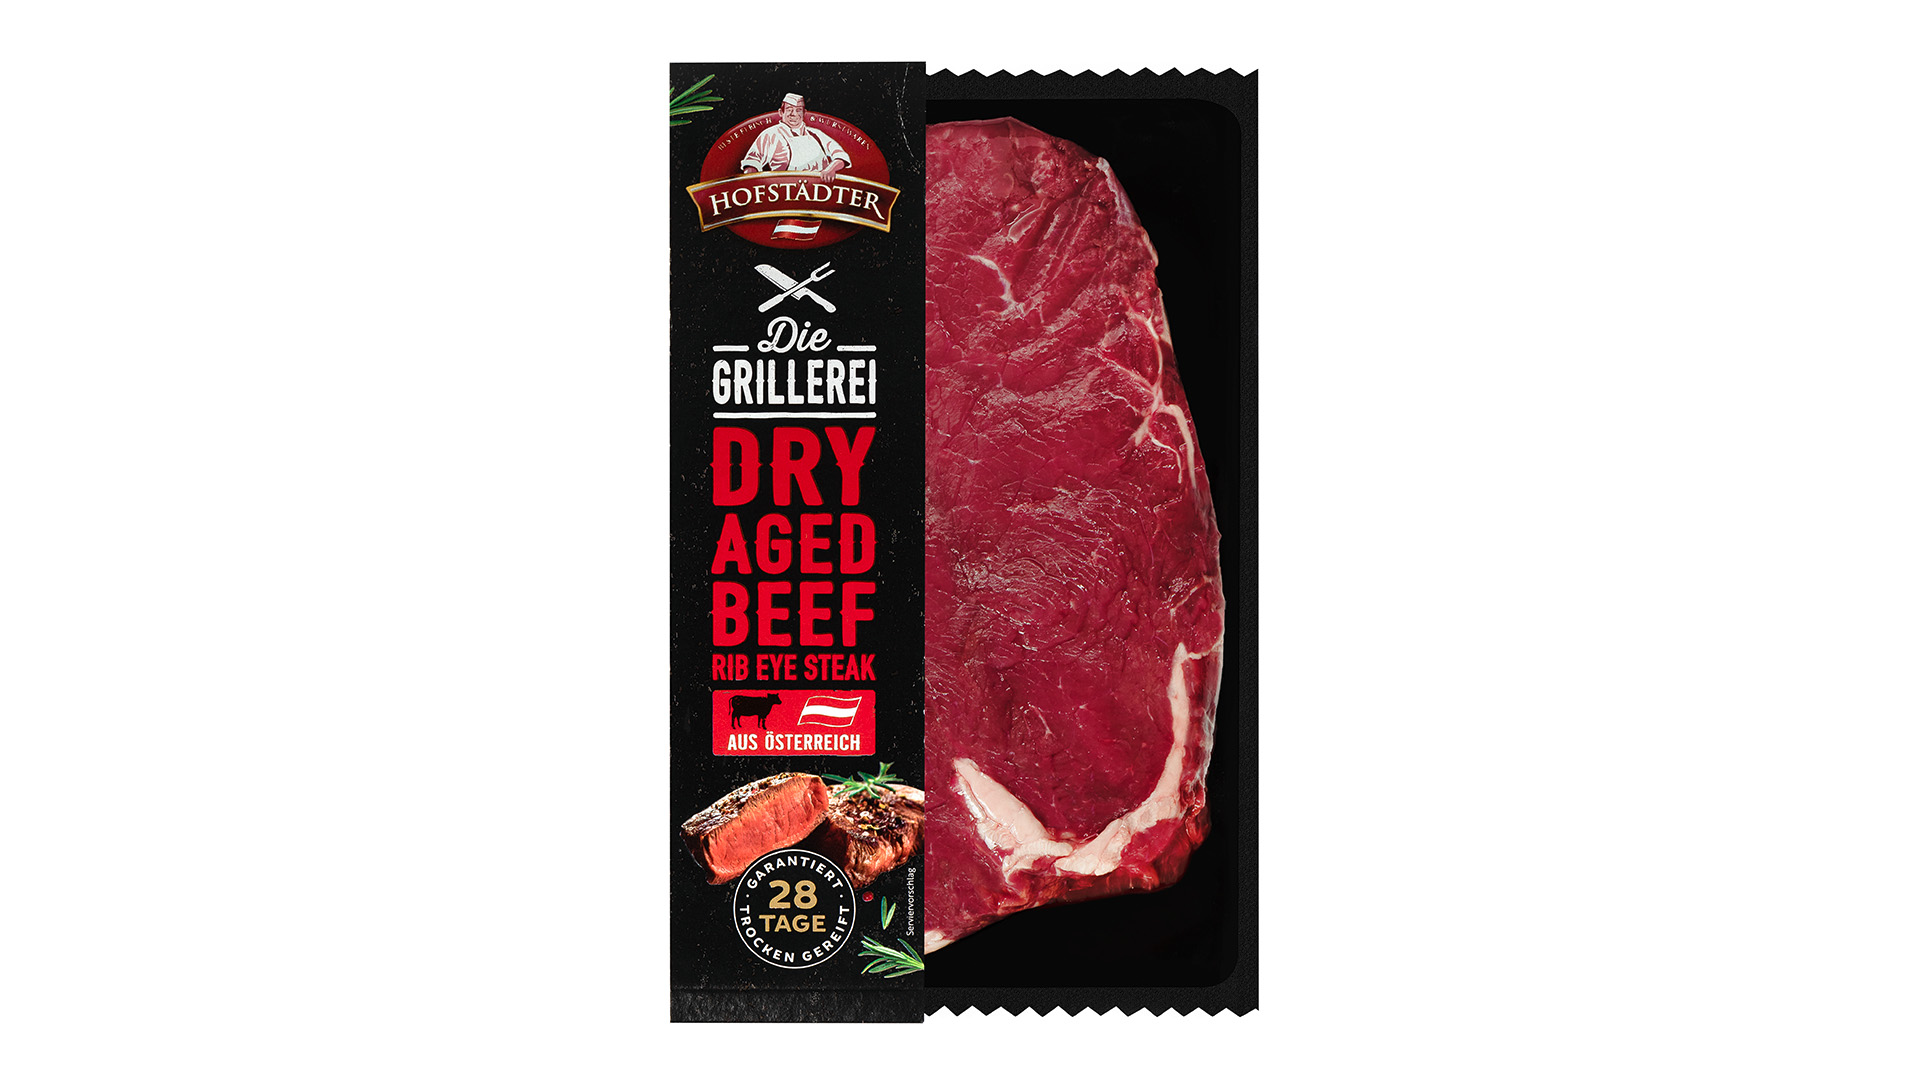 Hofstädter Dry Aged Rib Eye Steak